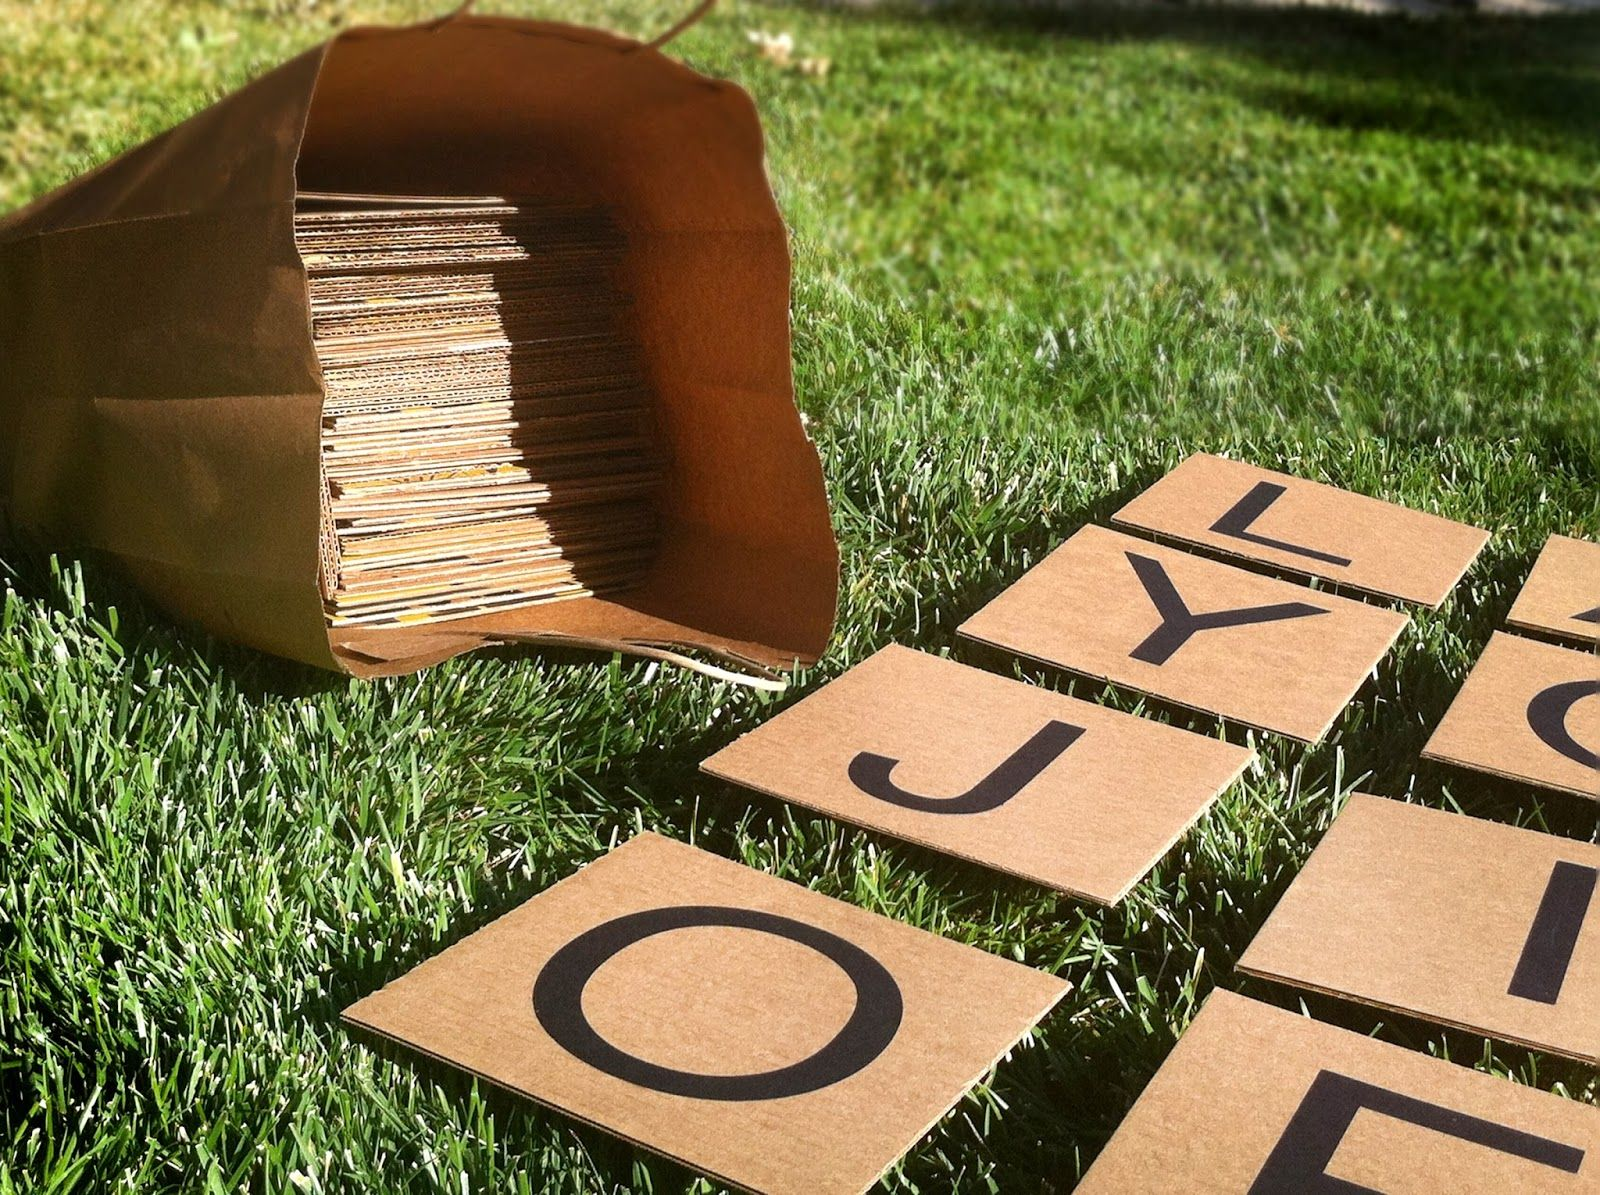 Diy Outdoor Games 17 Diy Games For Outdoor Family Fun Home Stories A To Z Games